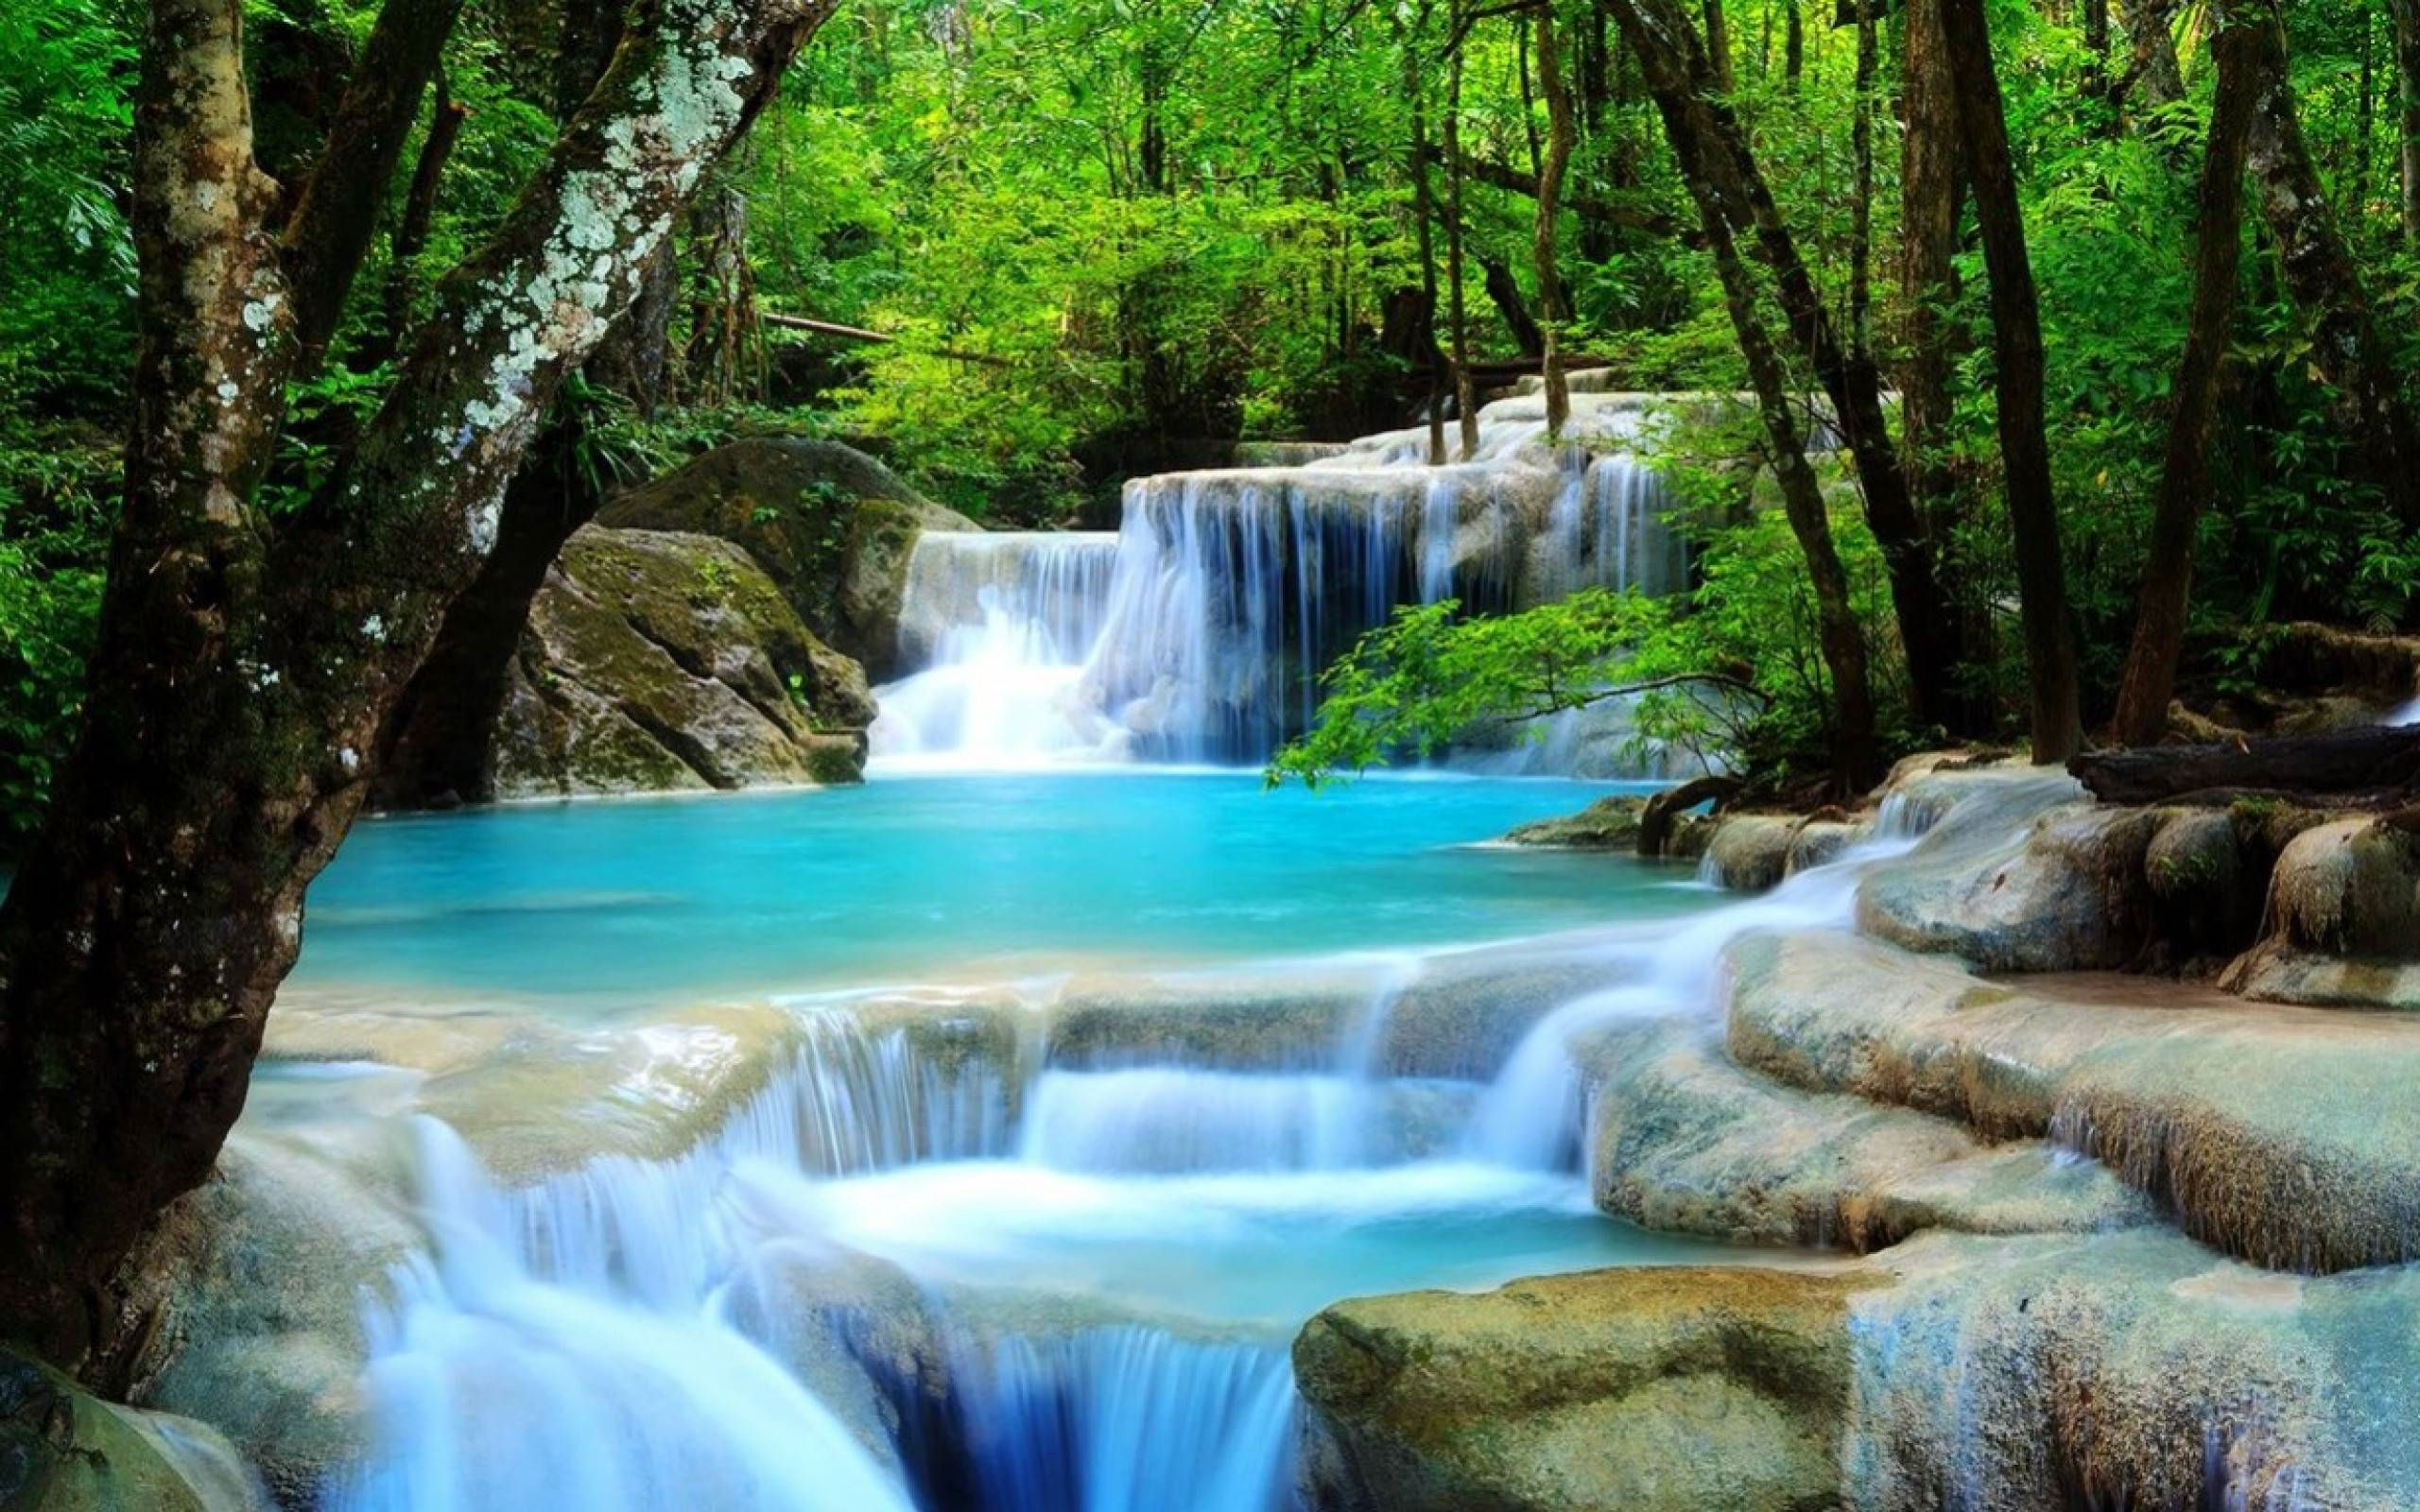 Waterfall Image For Desktop Wallpaper 2560 x 1600 px 1.2